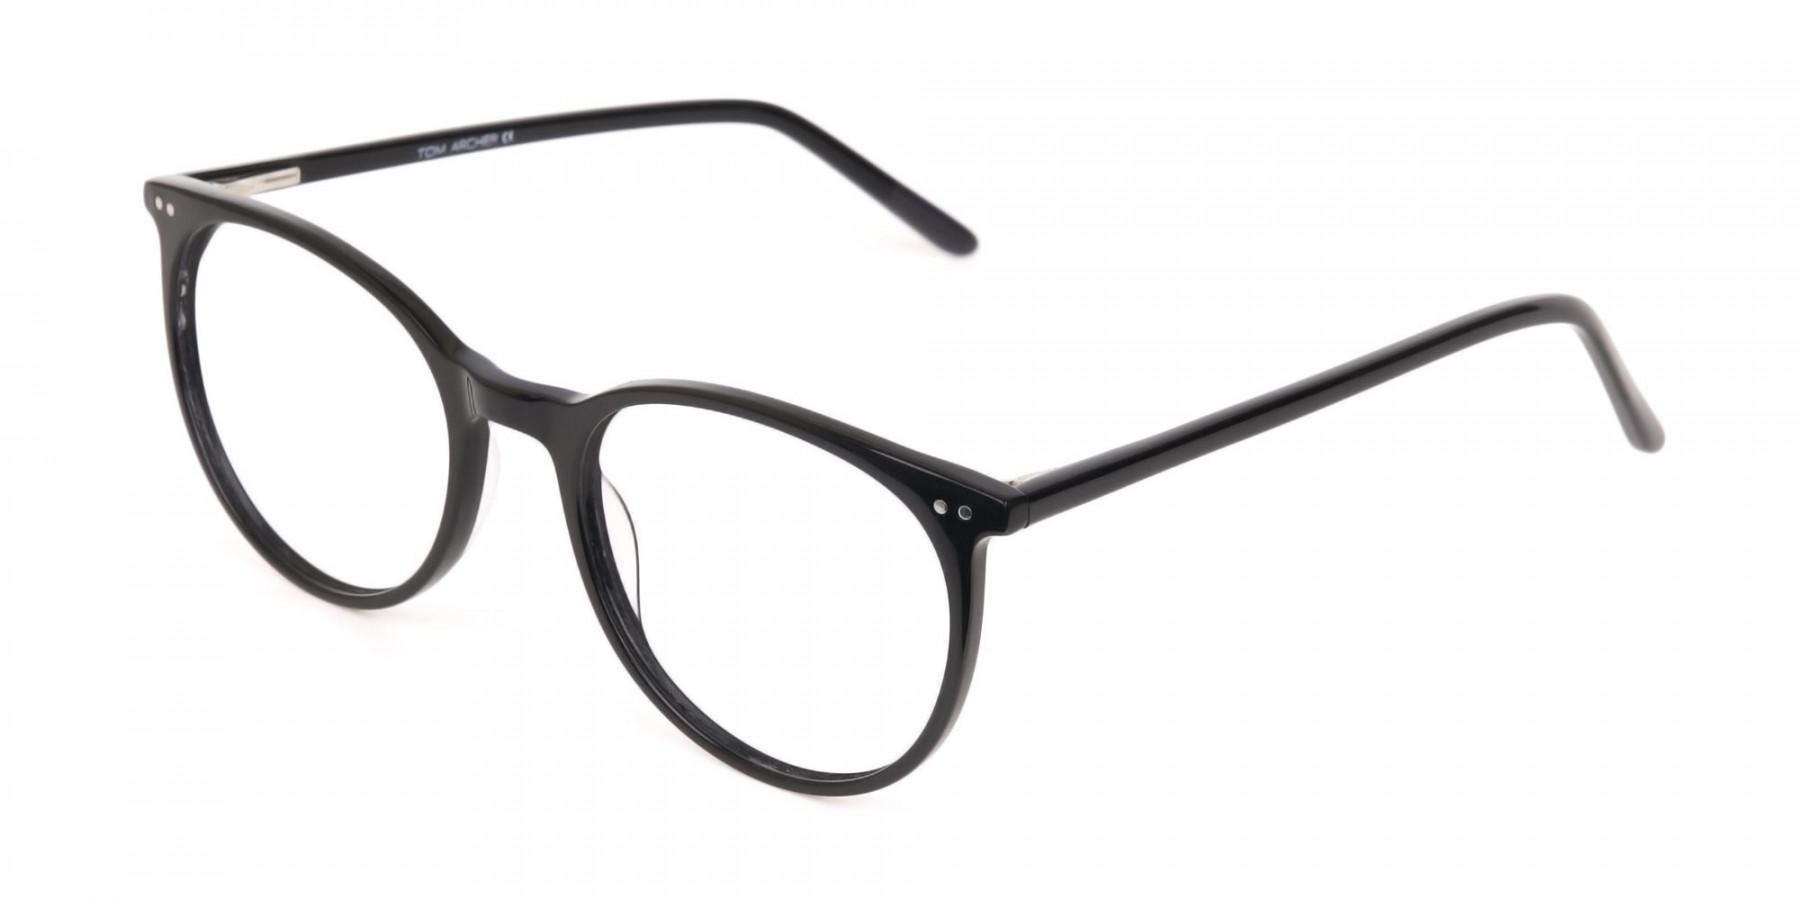 Designer Black Round Acetate Frame For Unisex-1